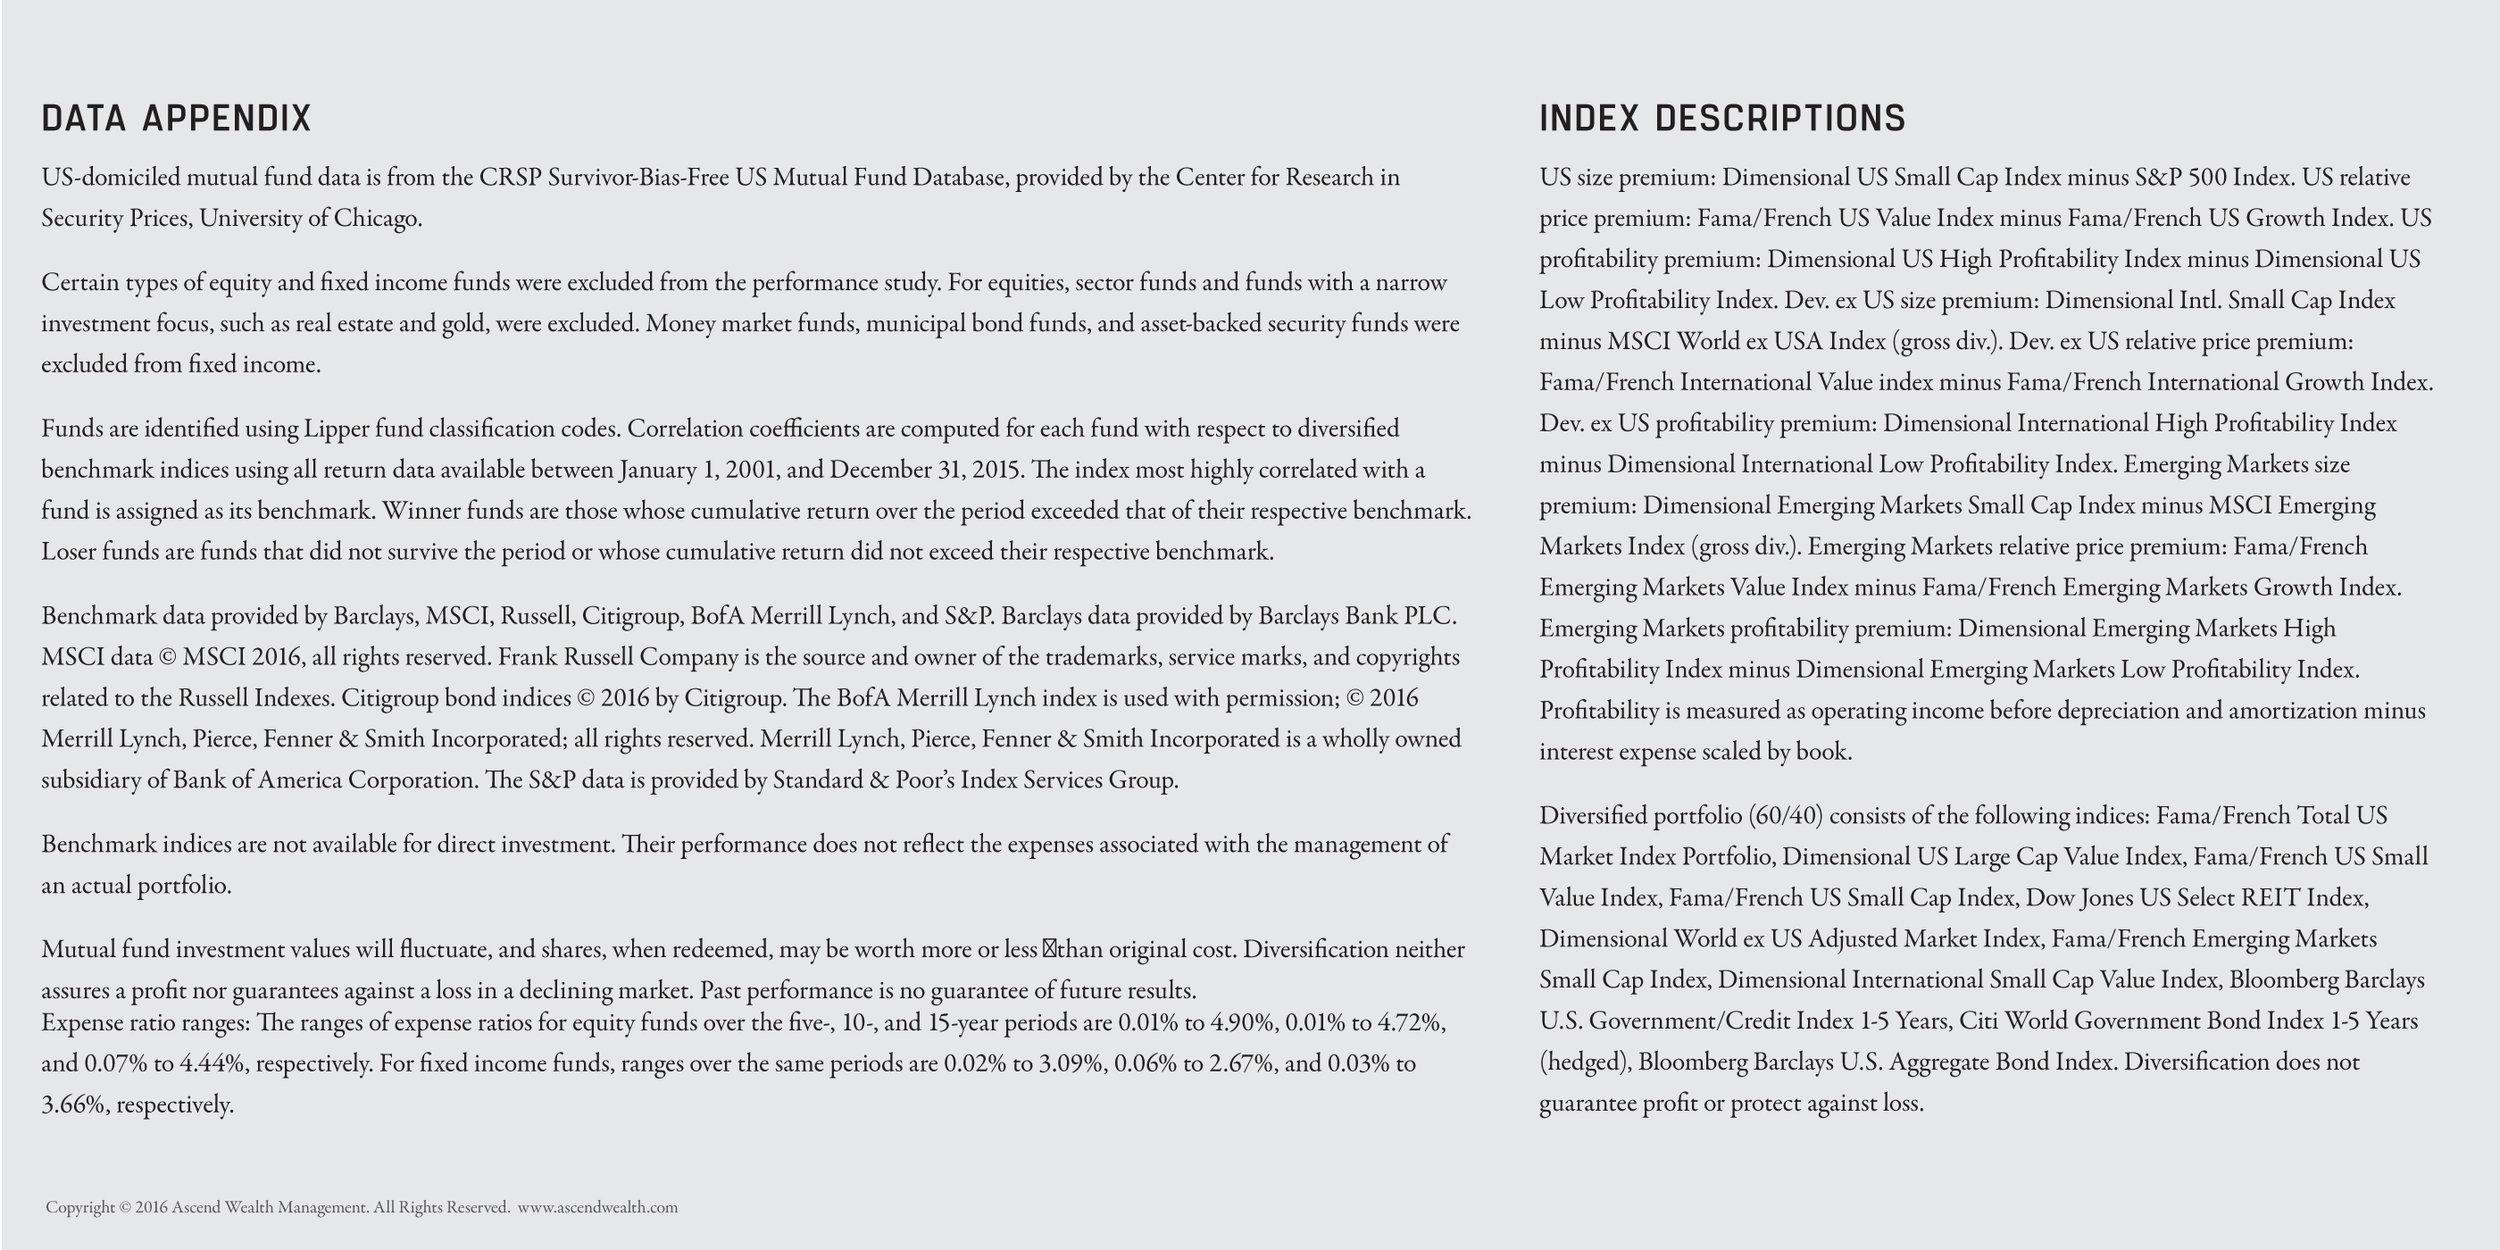 Ascend_InvestmentApproach_Final_Appendix.jpg